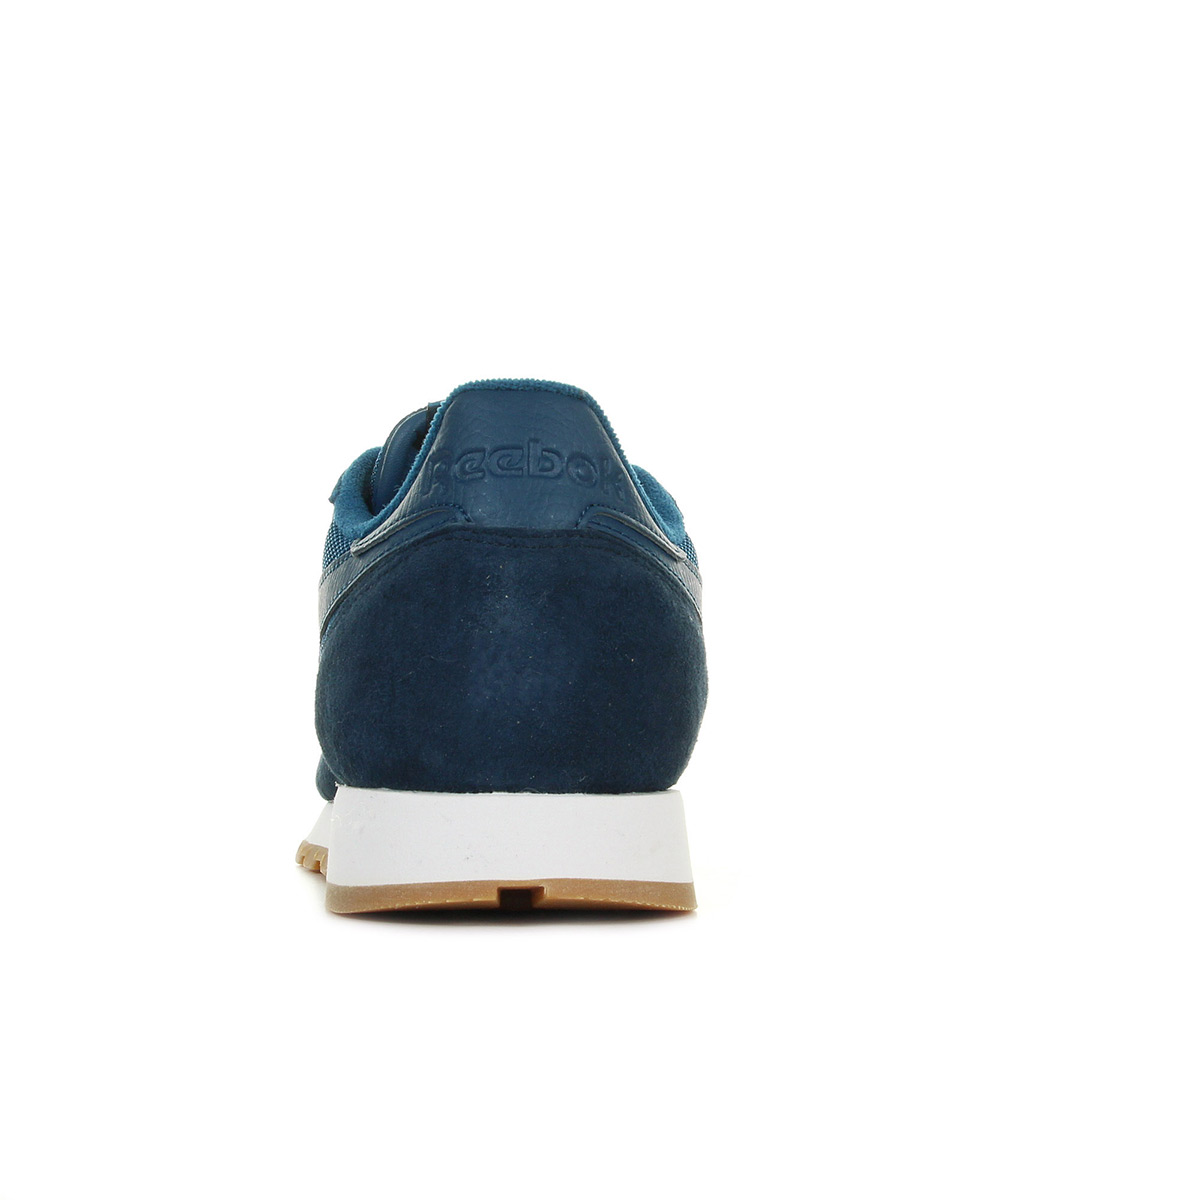 Reebok CL Leather Spp AR3775, Baskets mode homme